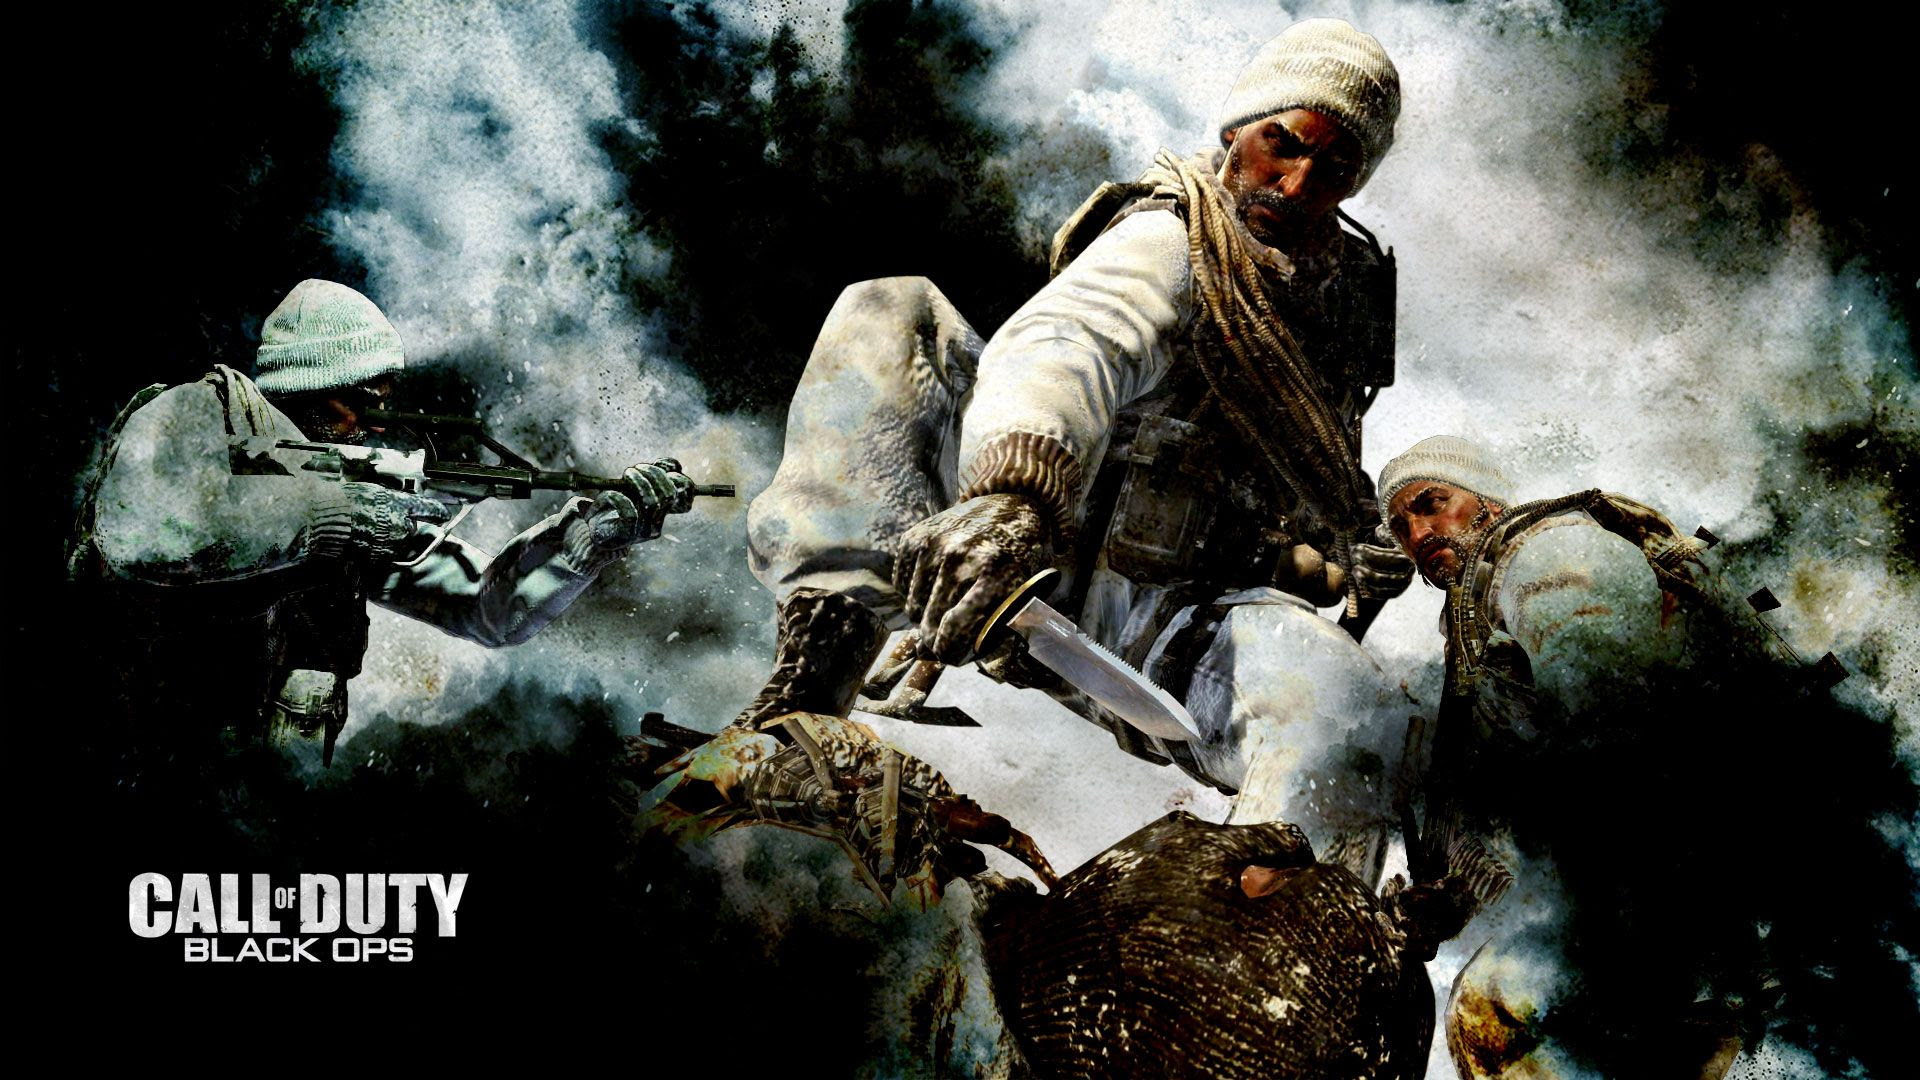 Download Call Of Duty Legends Of War Hd Wallpaper